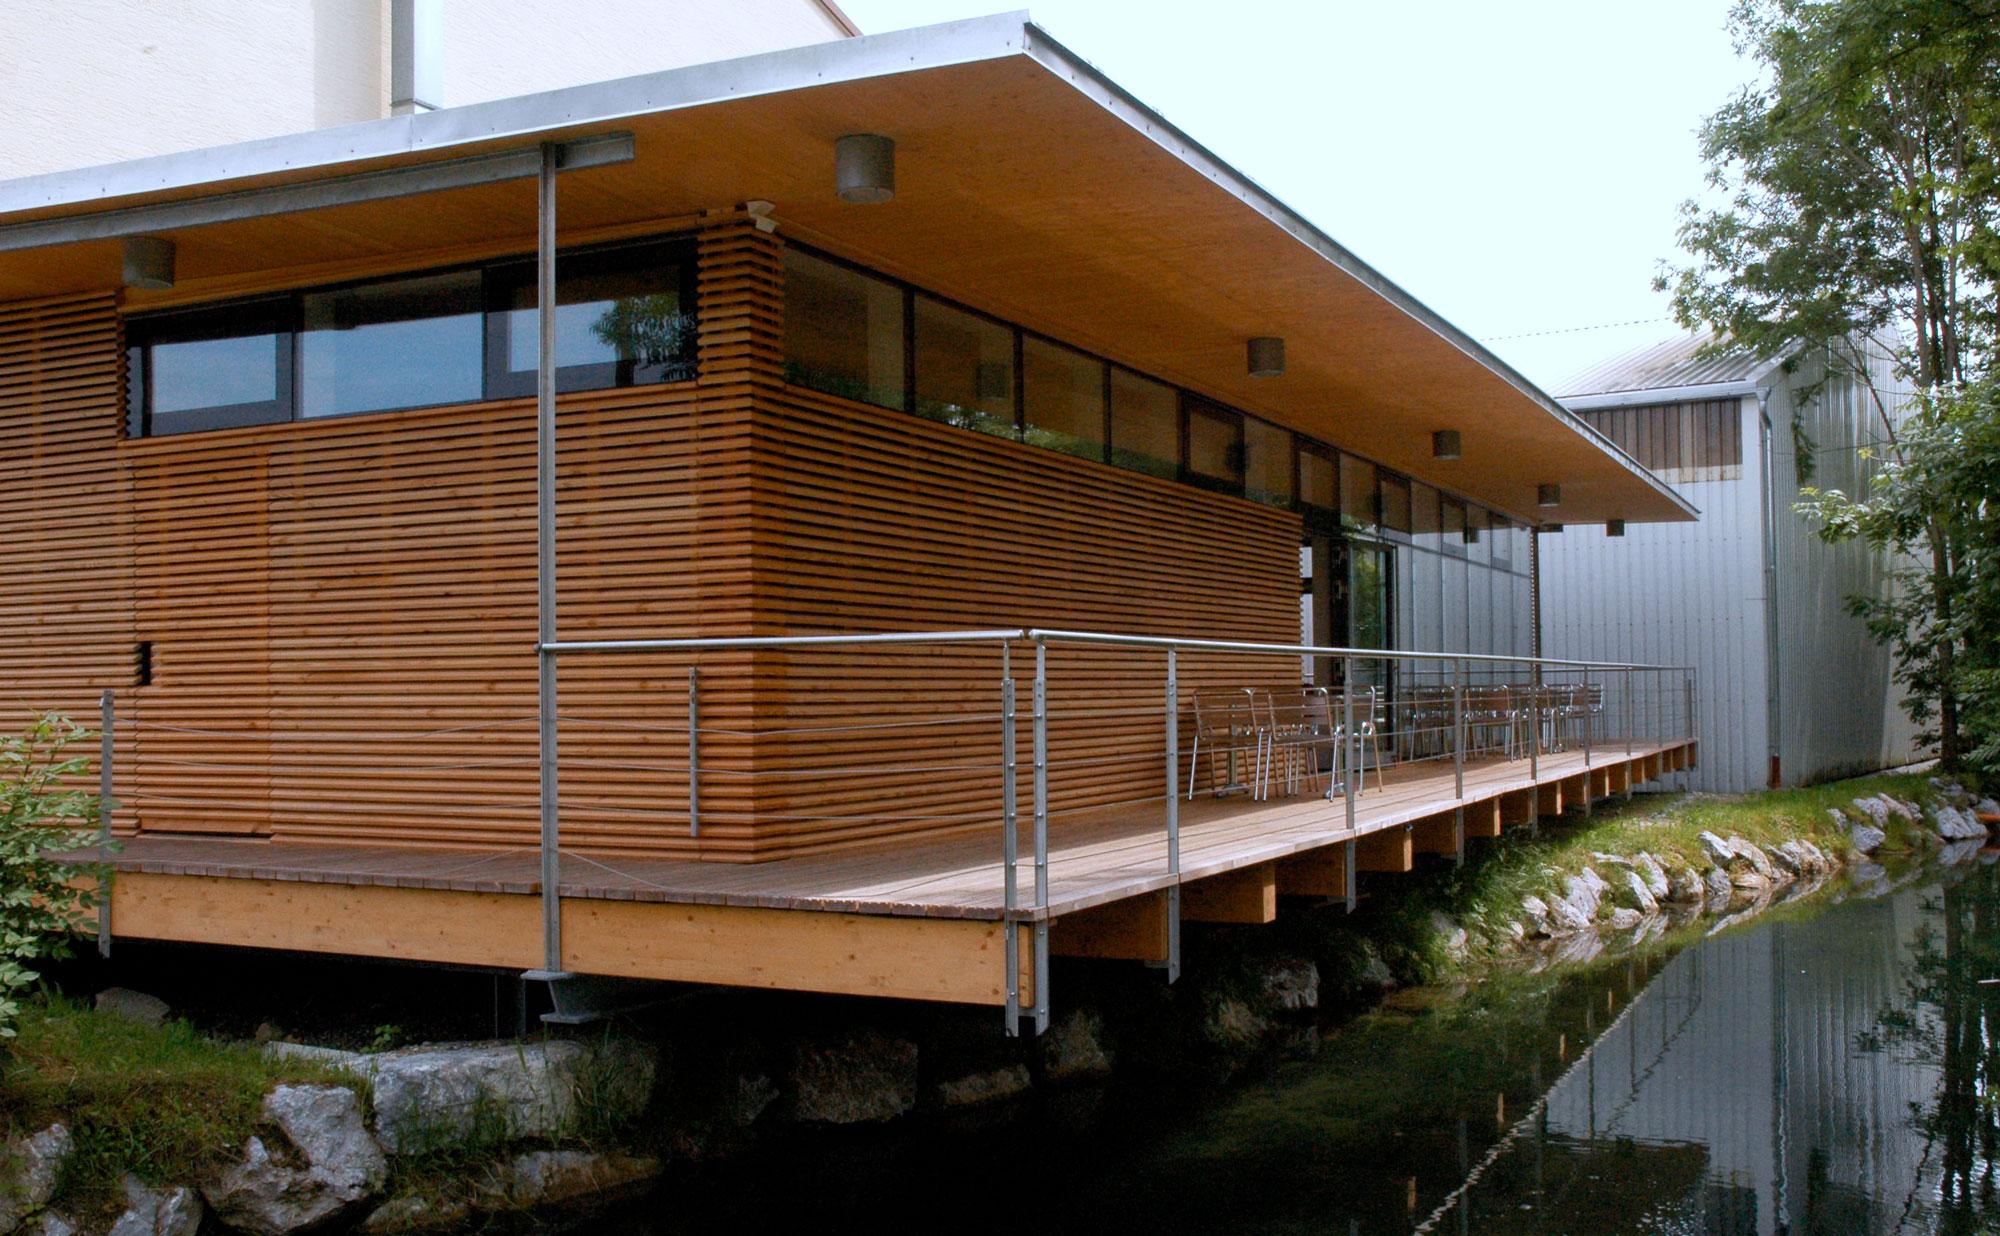 Blaesig-Architekten_Werkskantine-Neenah-Gessner-5